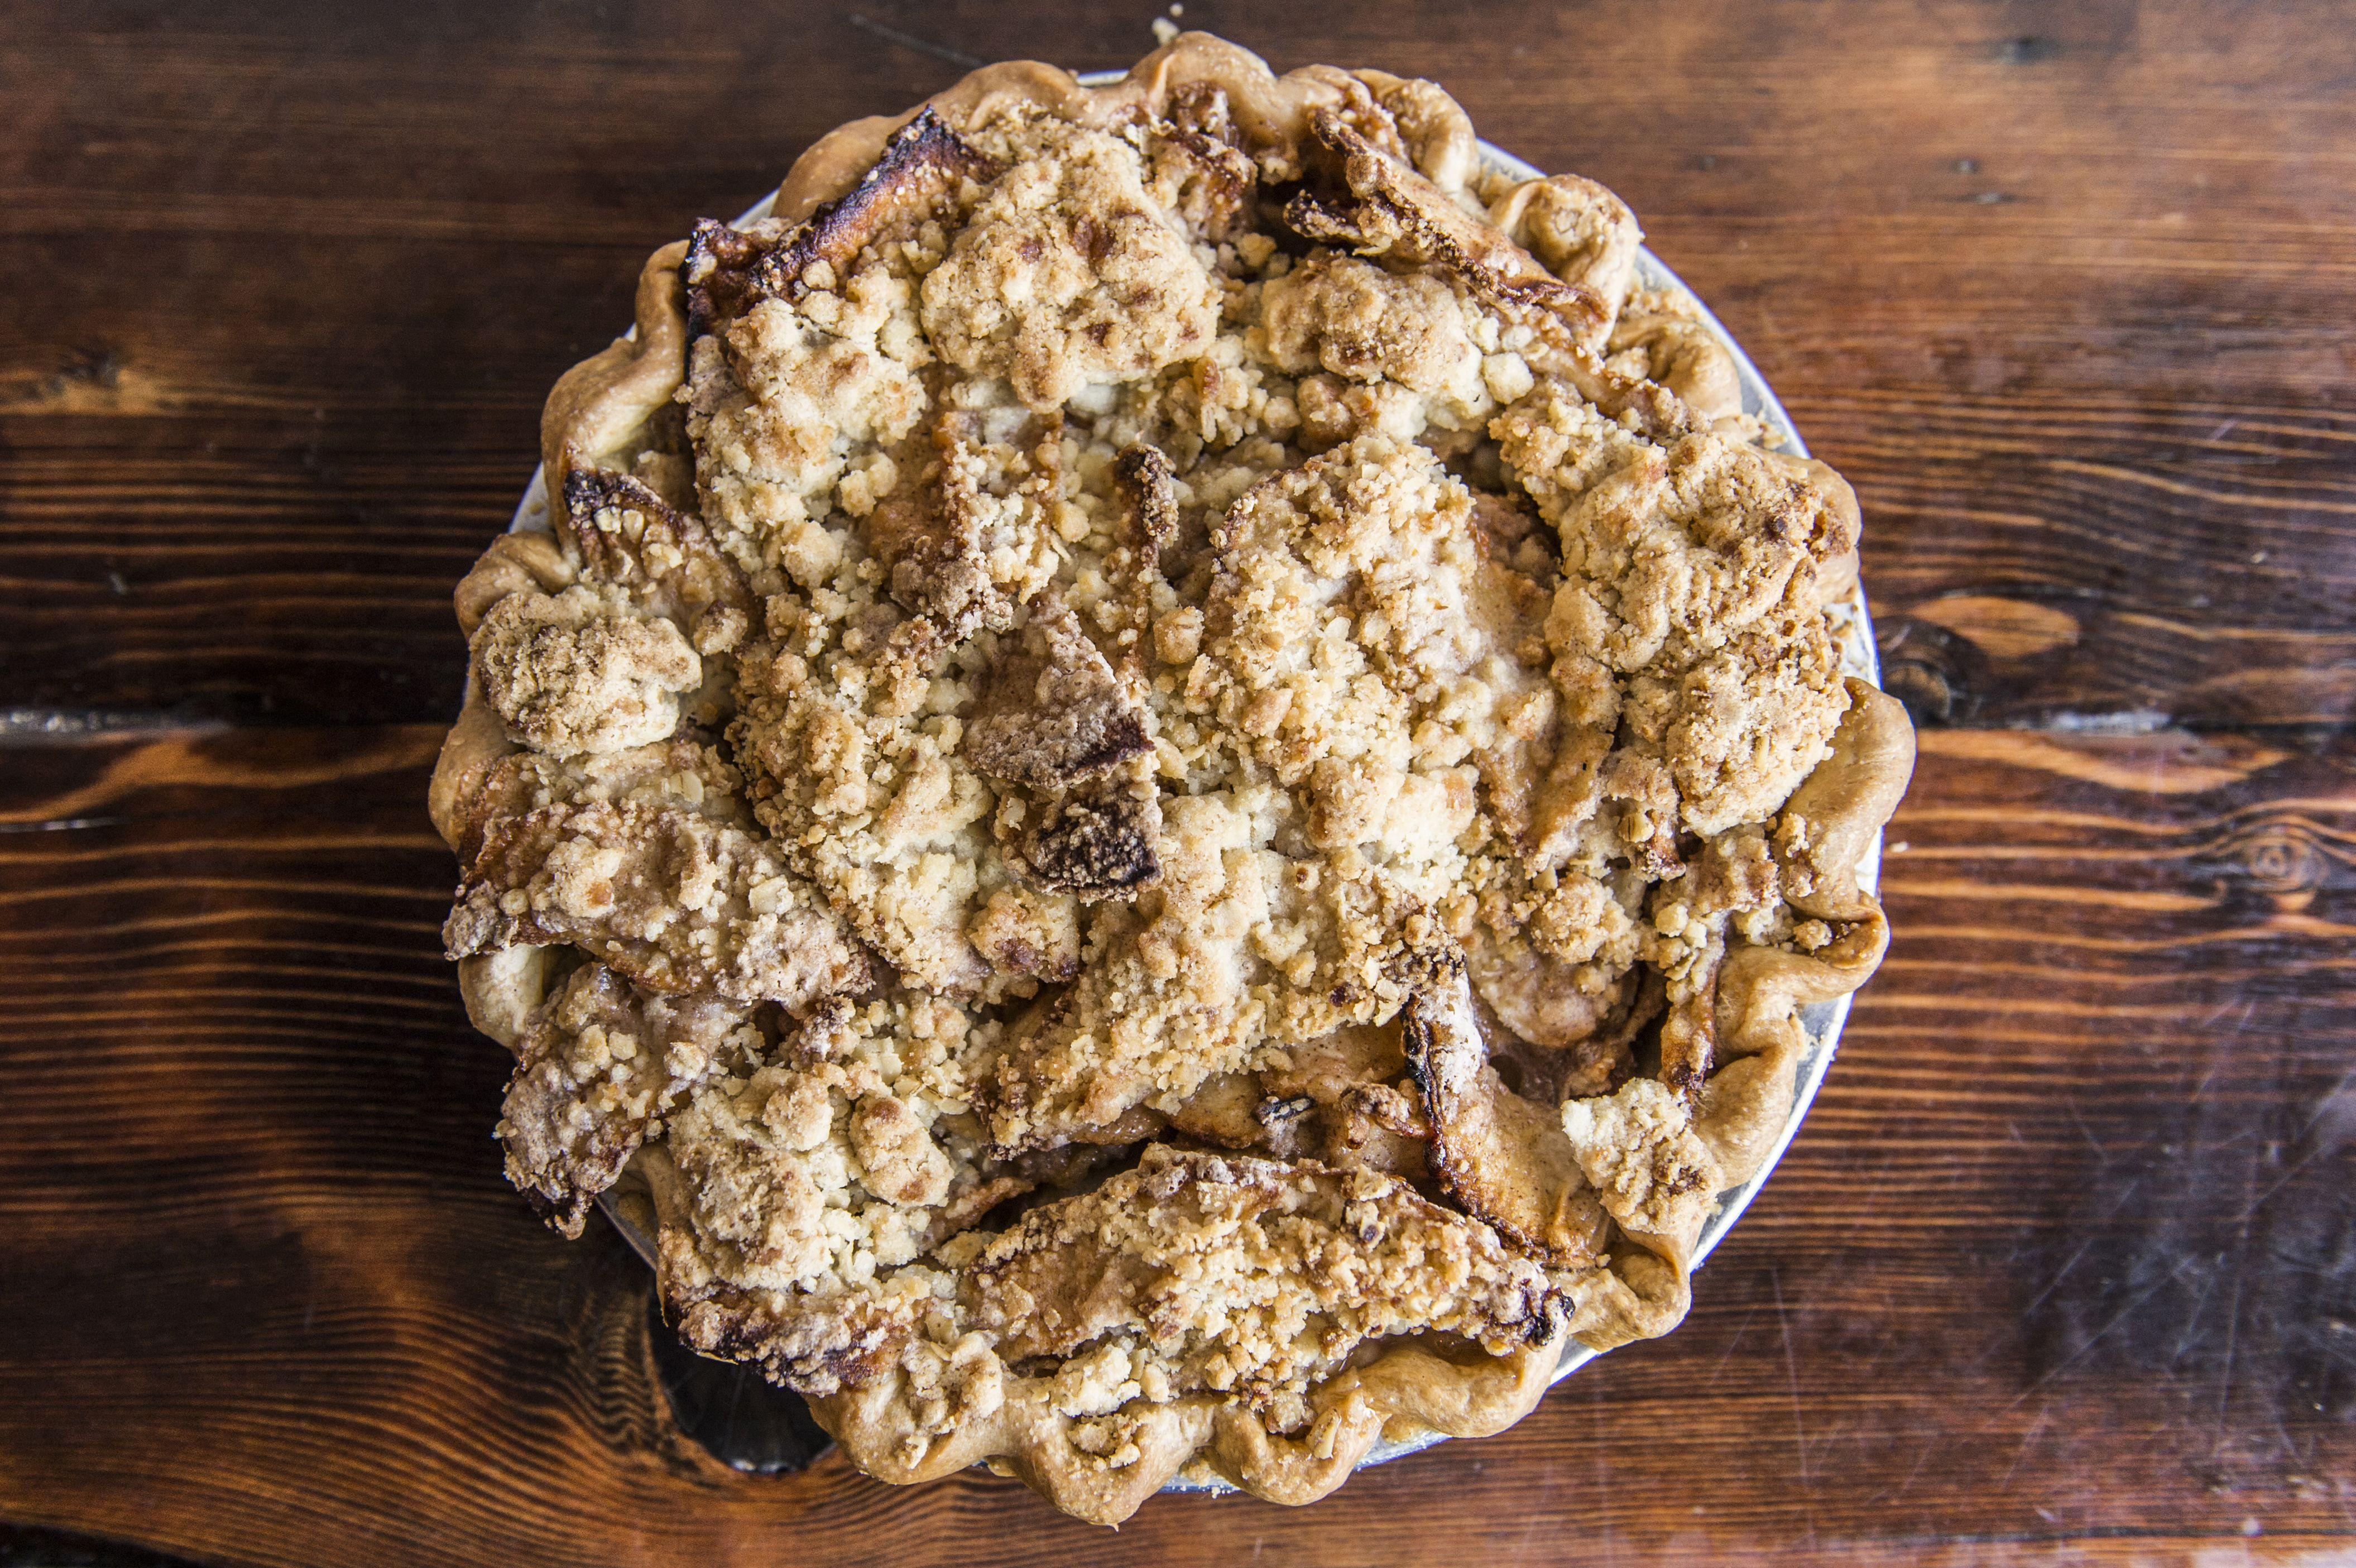 The Pie Hole Apple Pie